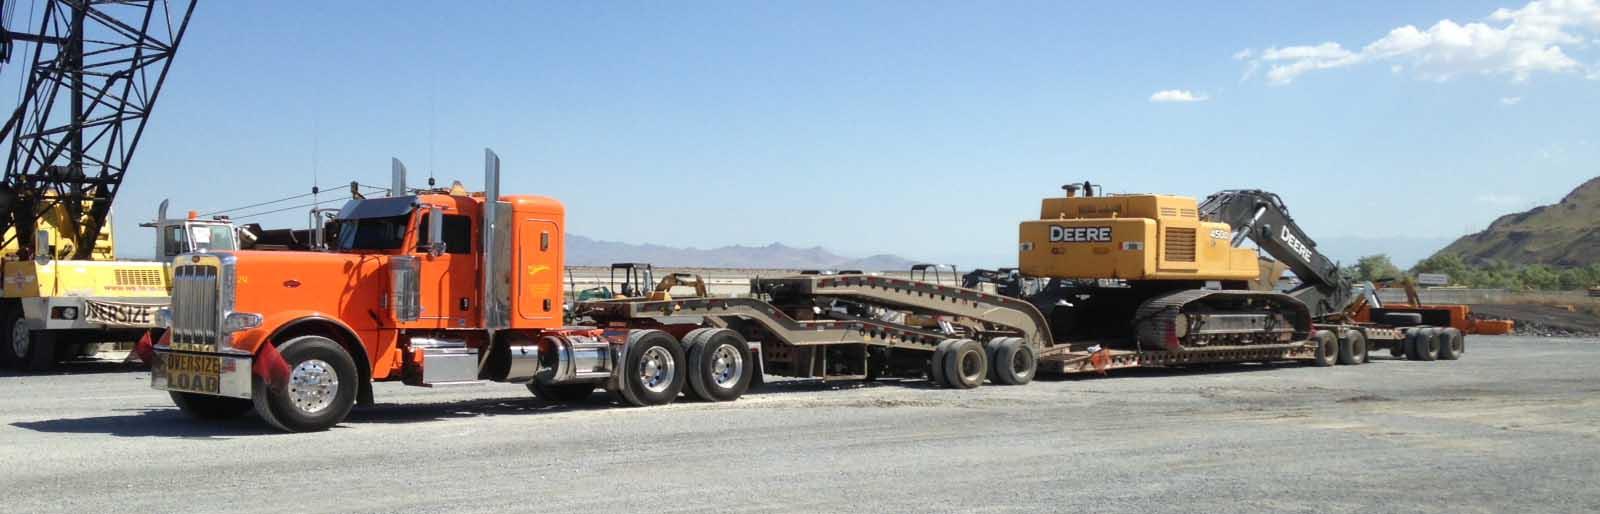 Equipment Transport Equipmenttransport Com